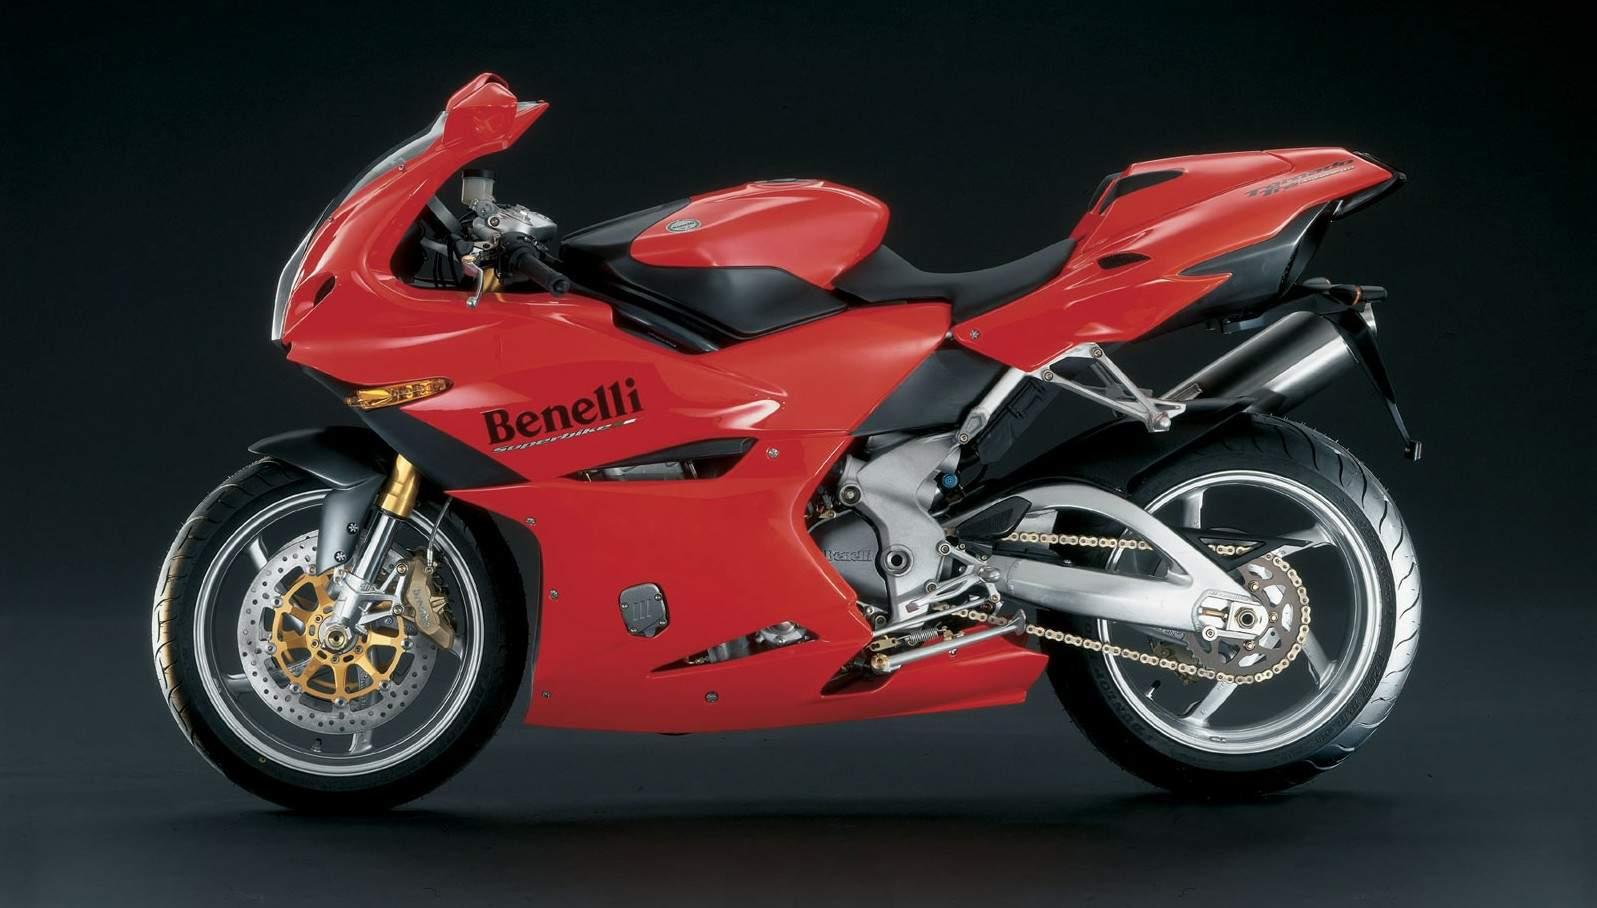 Benelli Tornado Novecentro Tre (2003-2012): Review & Buying Guide